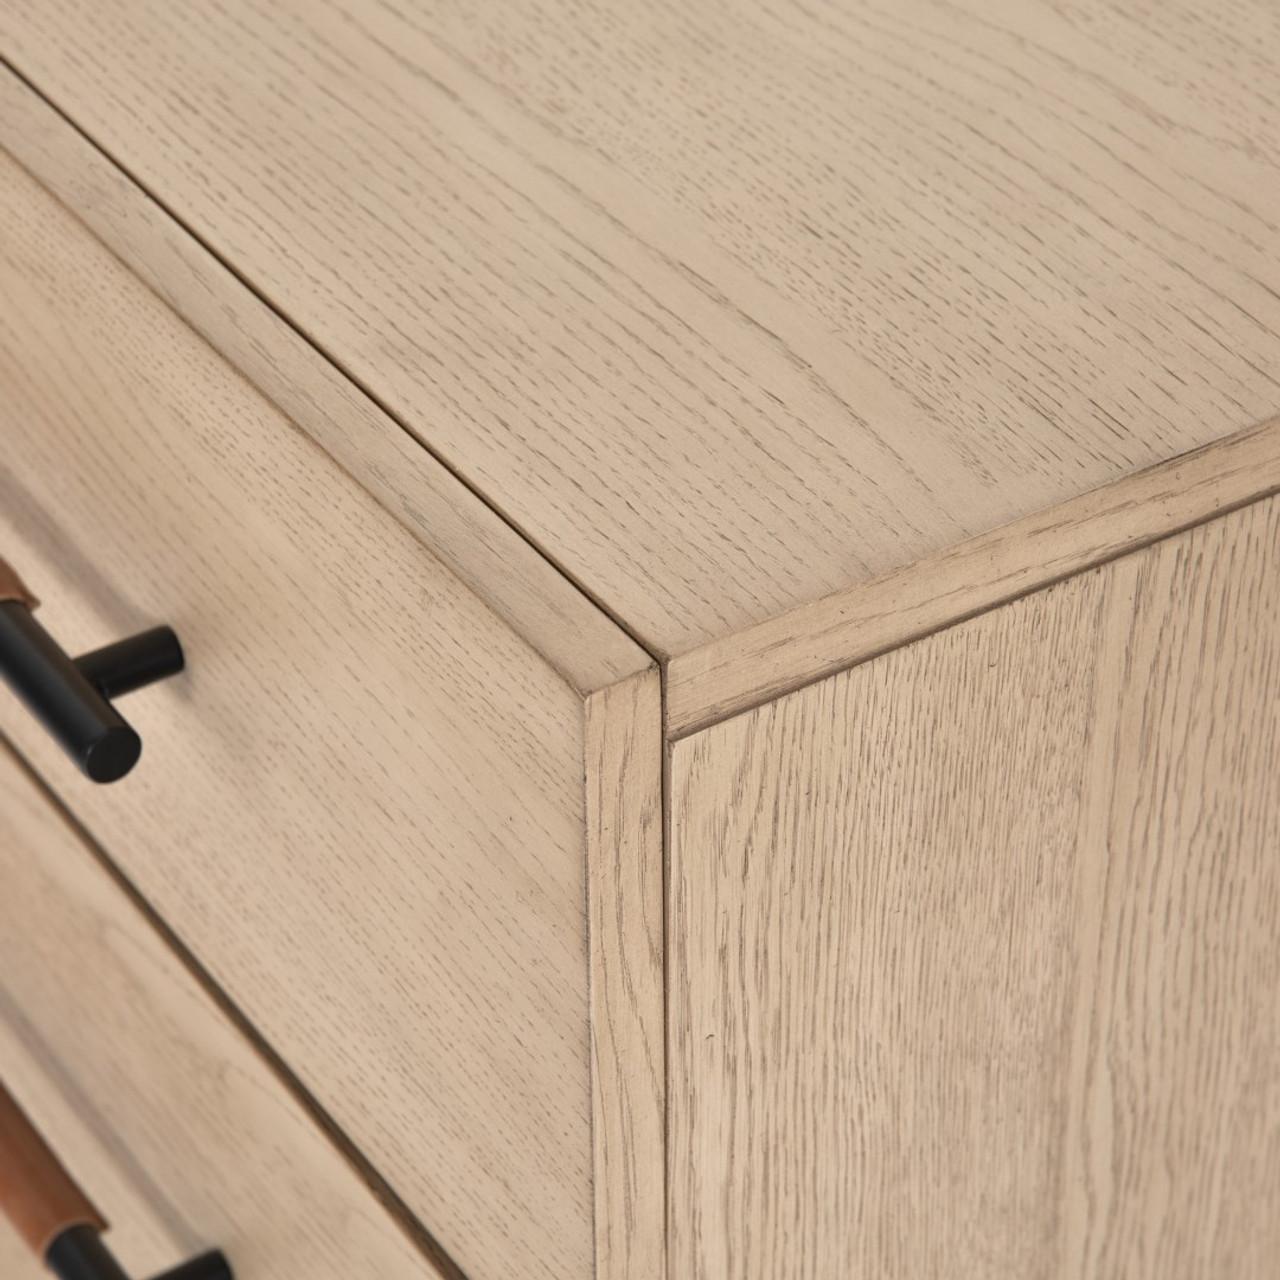 Ruse 6 Drawer Dresser - Yucca Oak